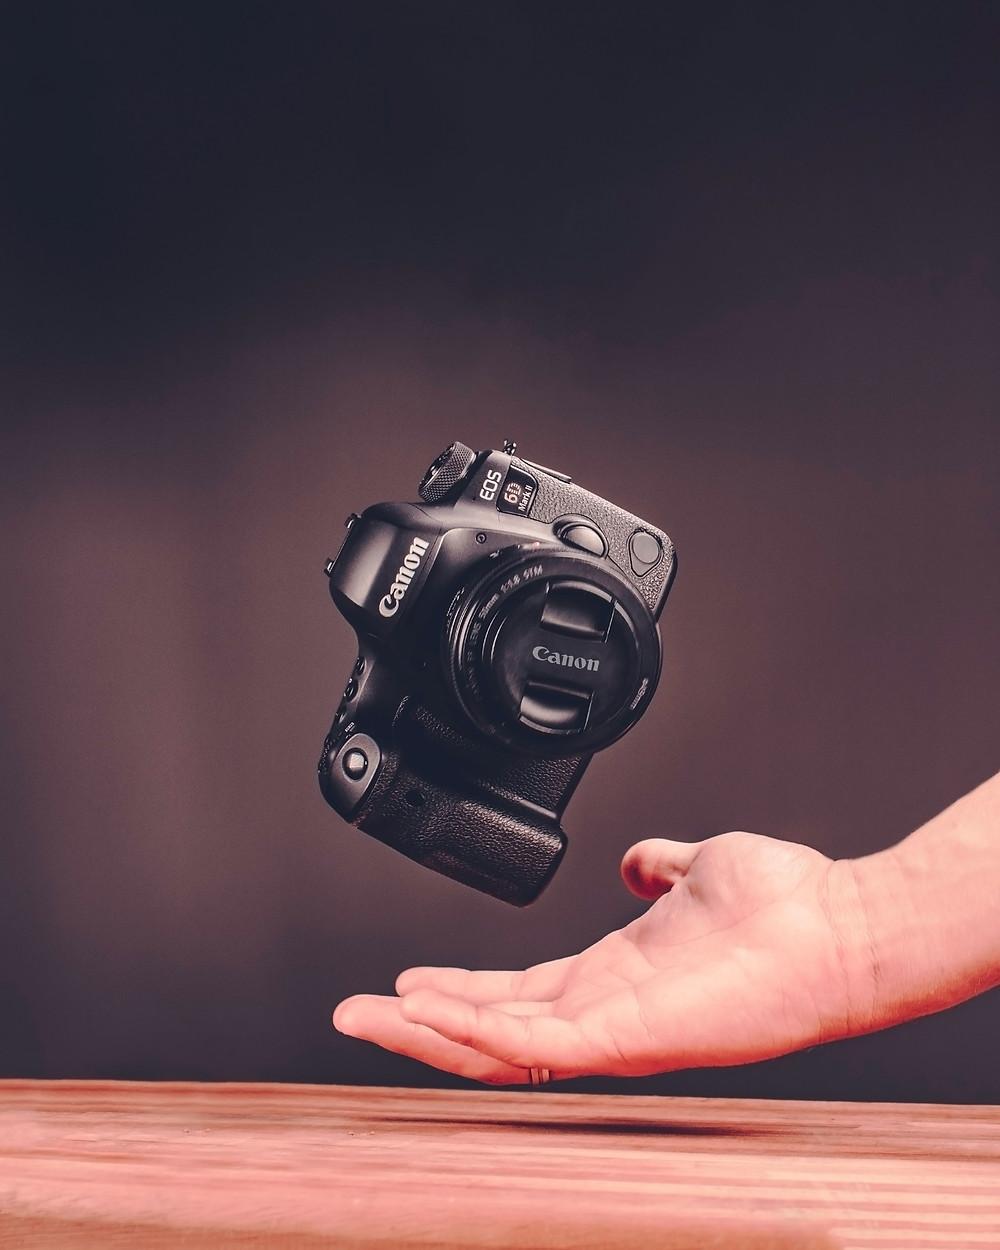 Hand catching falling camera